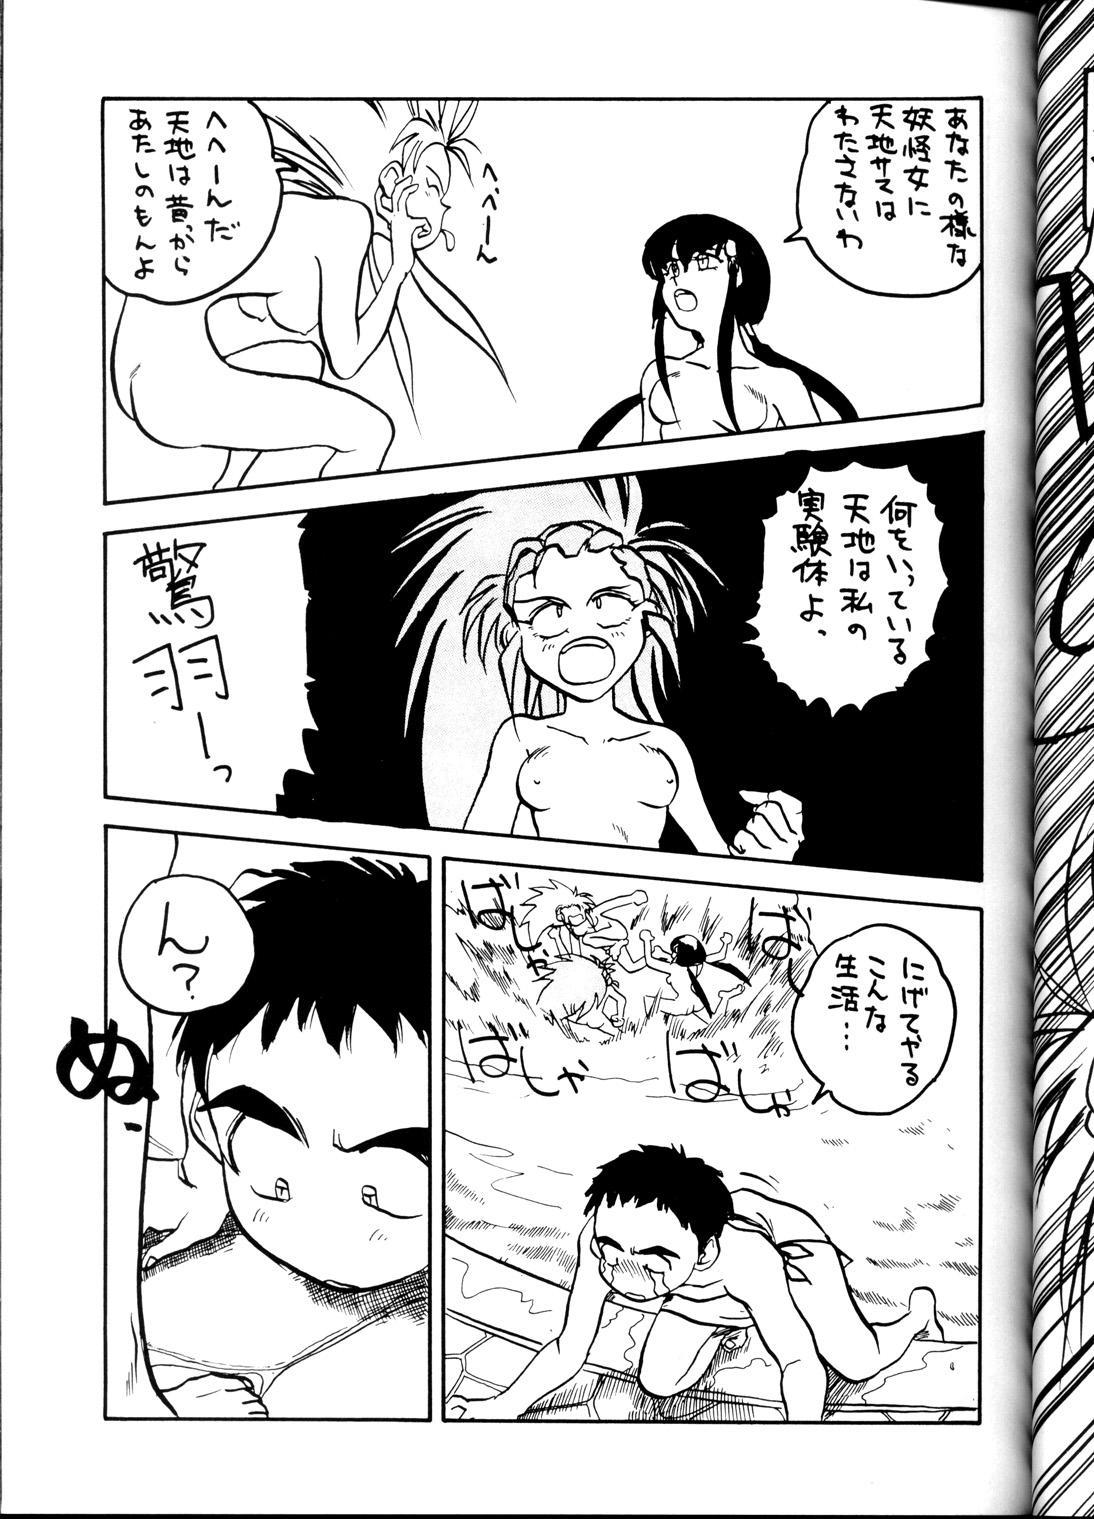 [B.B.C] Tenchi Muyou! Ryou-ou-ki Kaiteiben (Tenchi Muyou!) 33